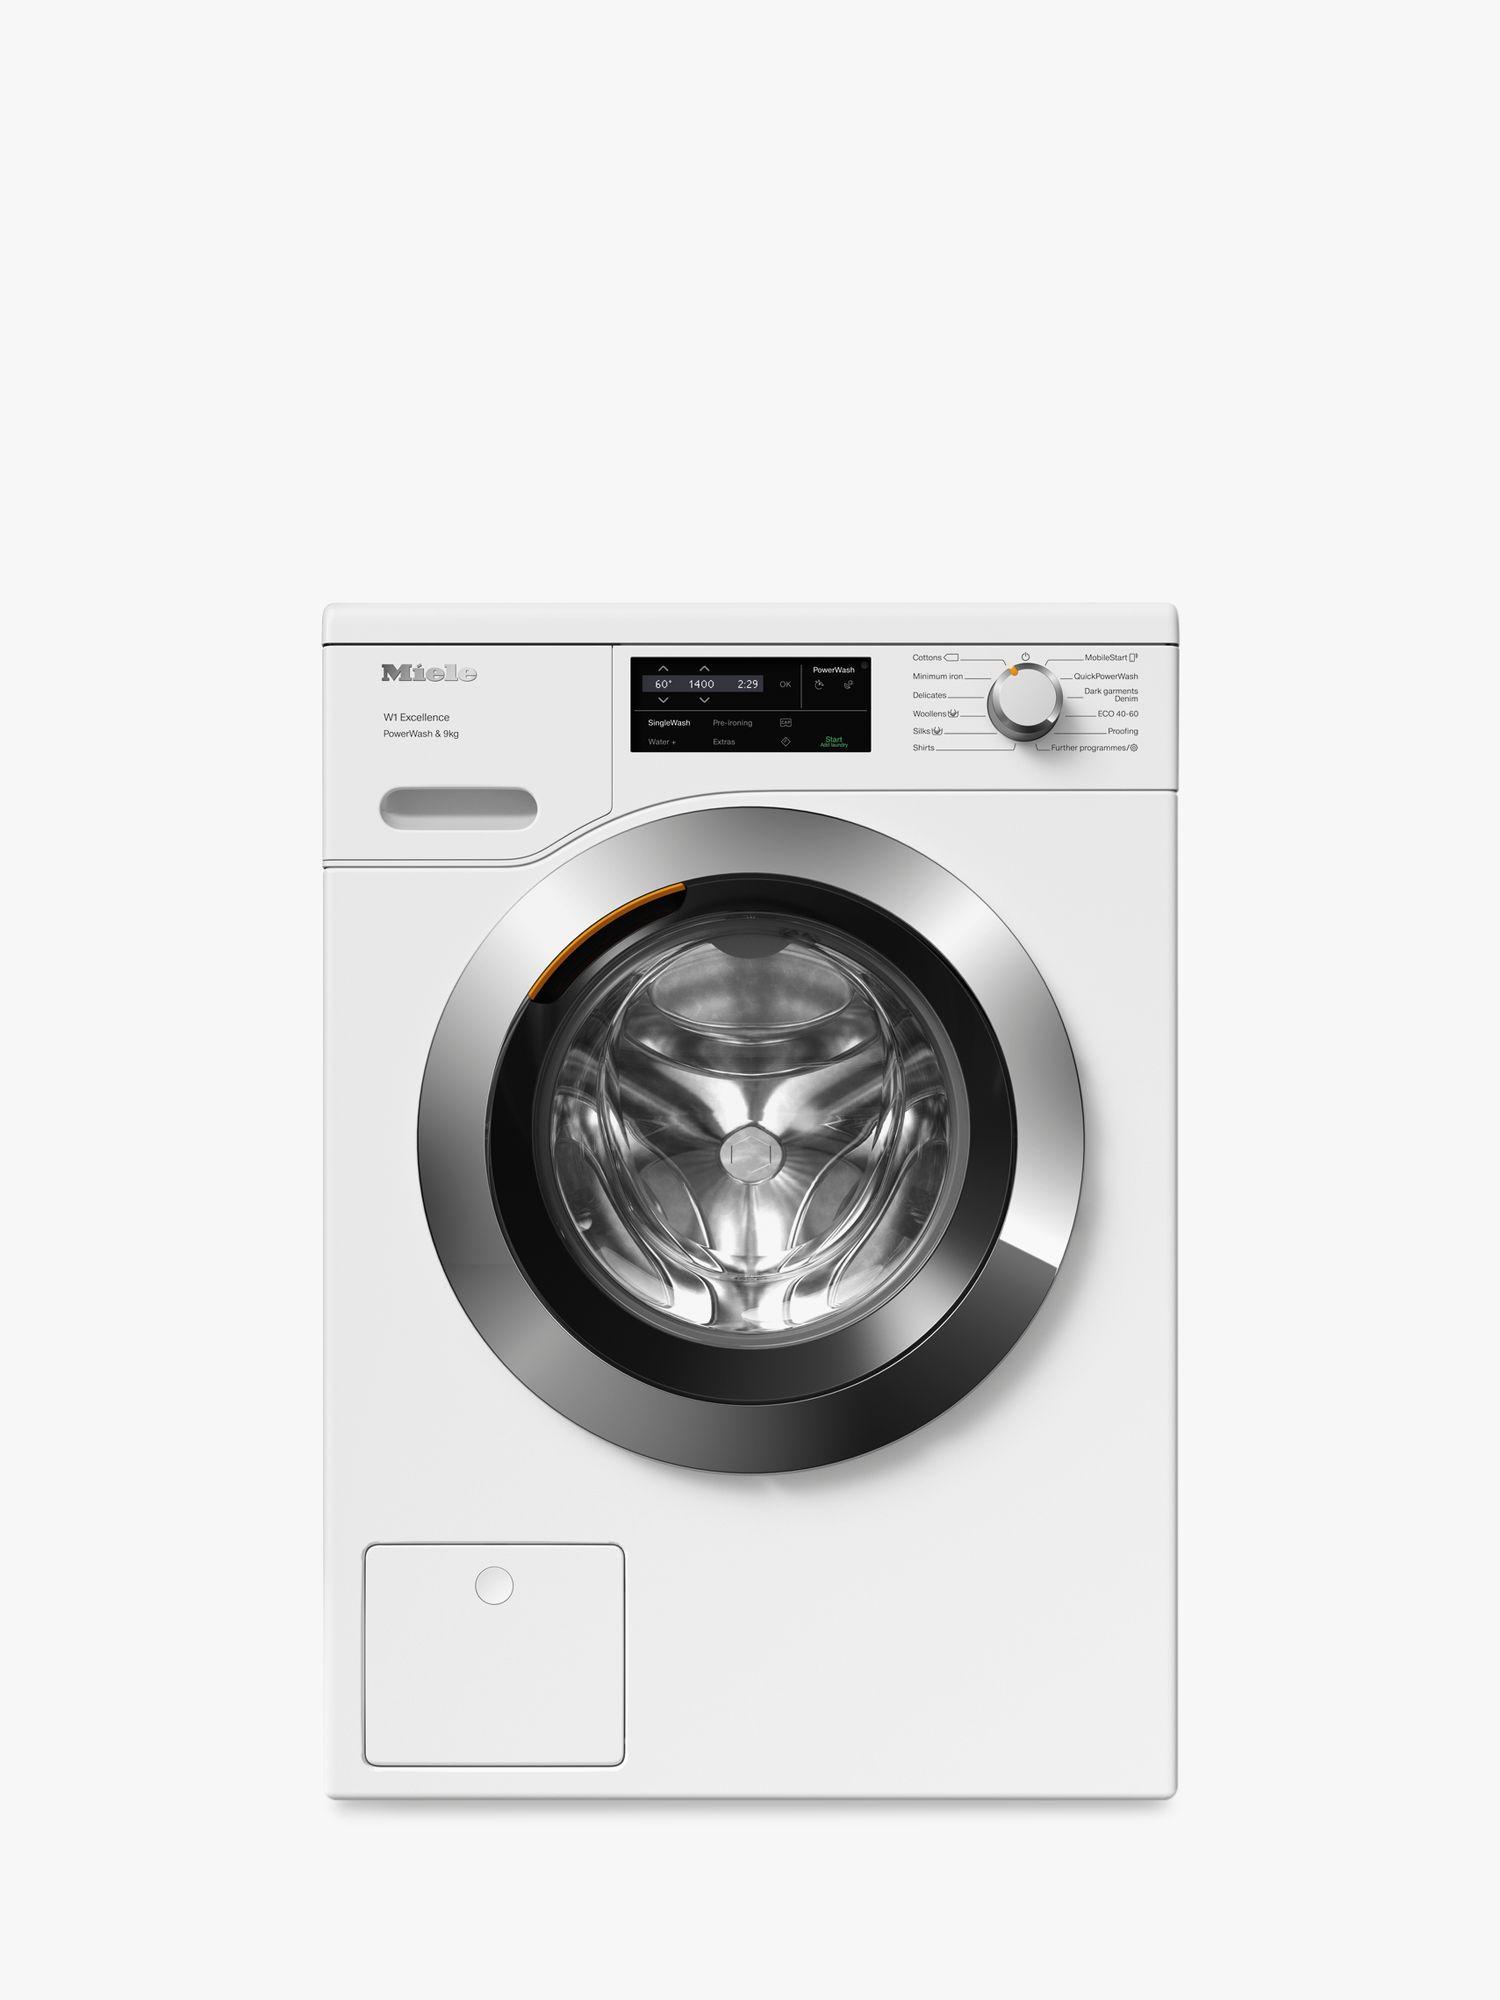 Miele Miele WEG365 Freestanding Washing Machine, 9kg Load, 1400rpm, A+++ Energy Rating, White